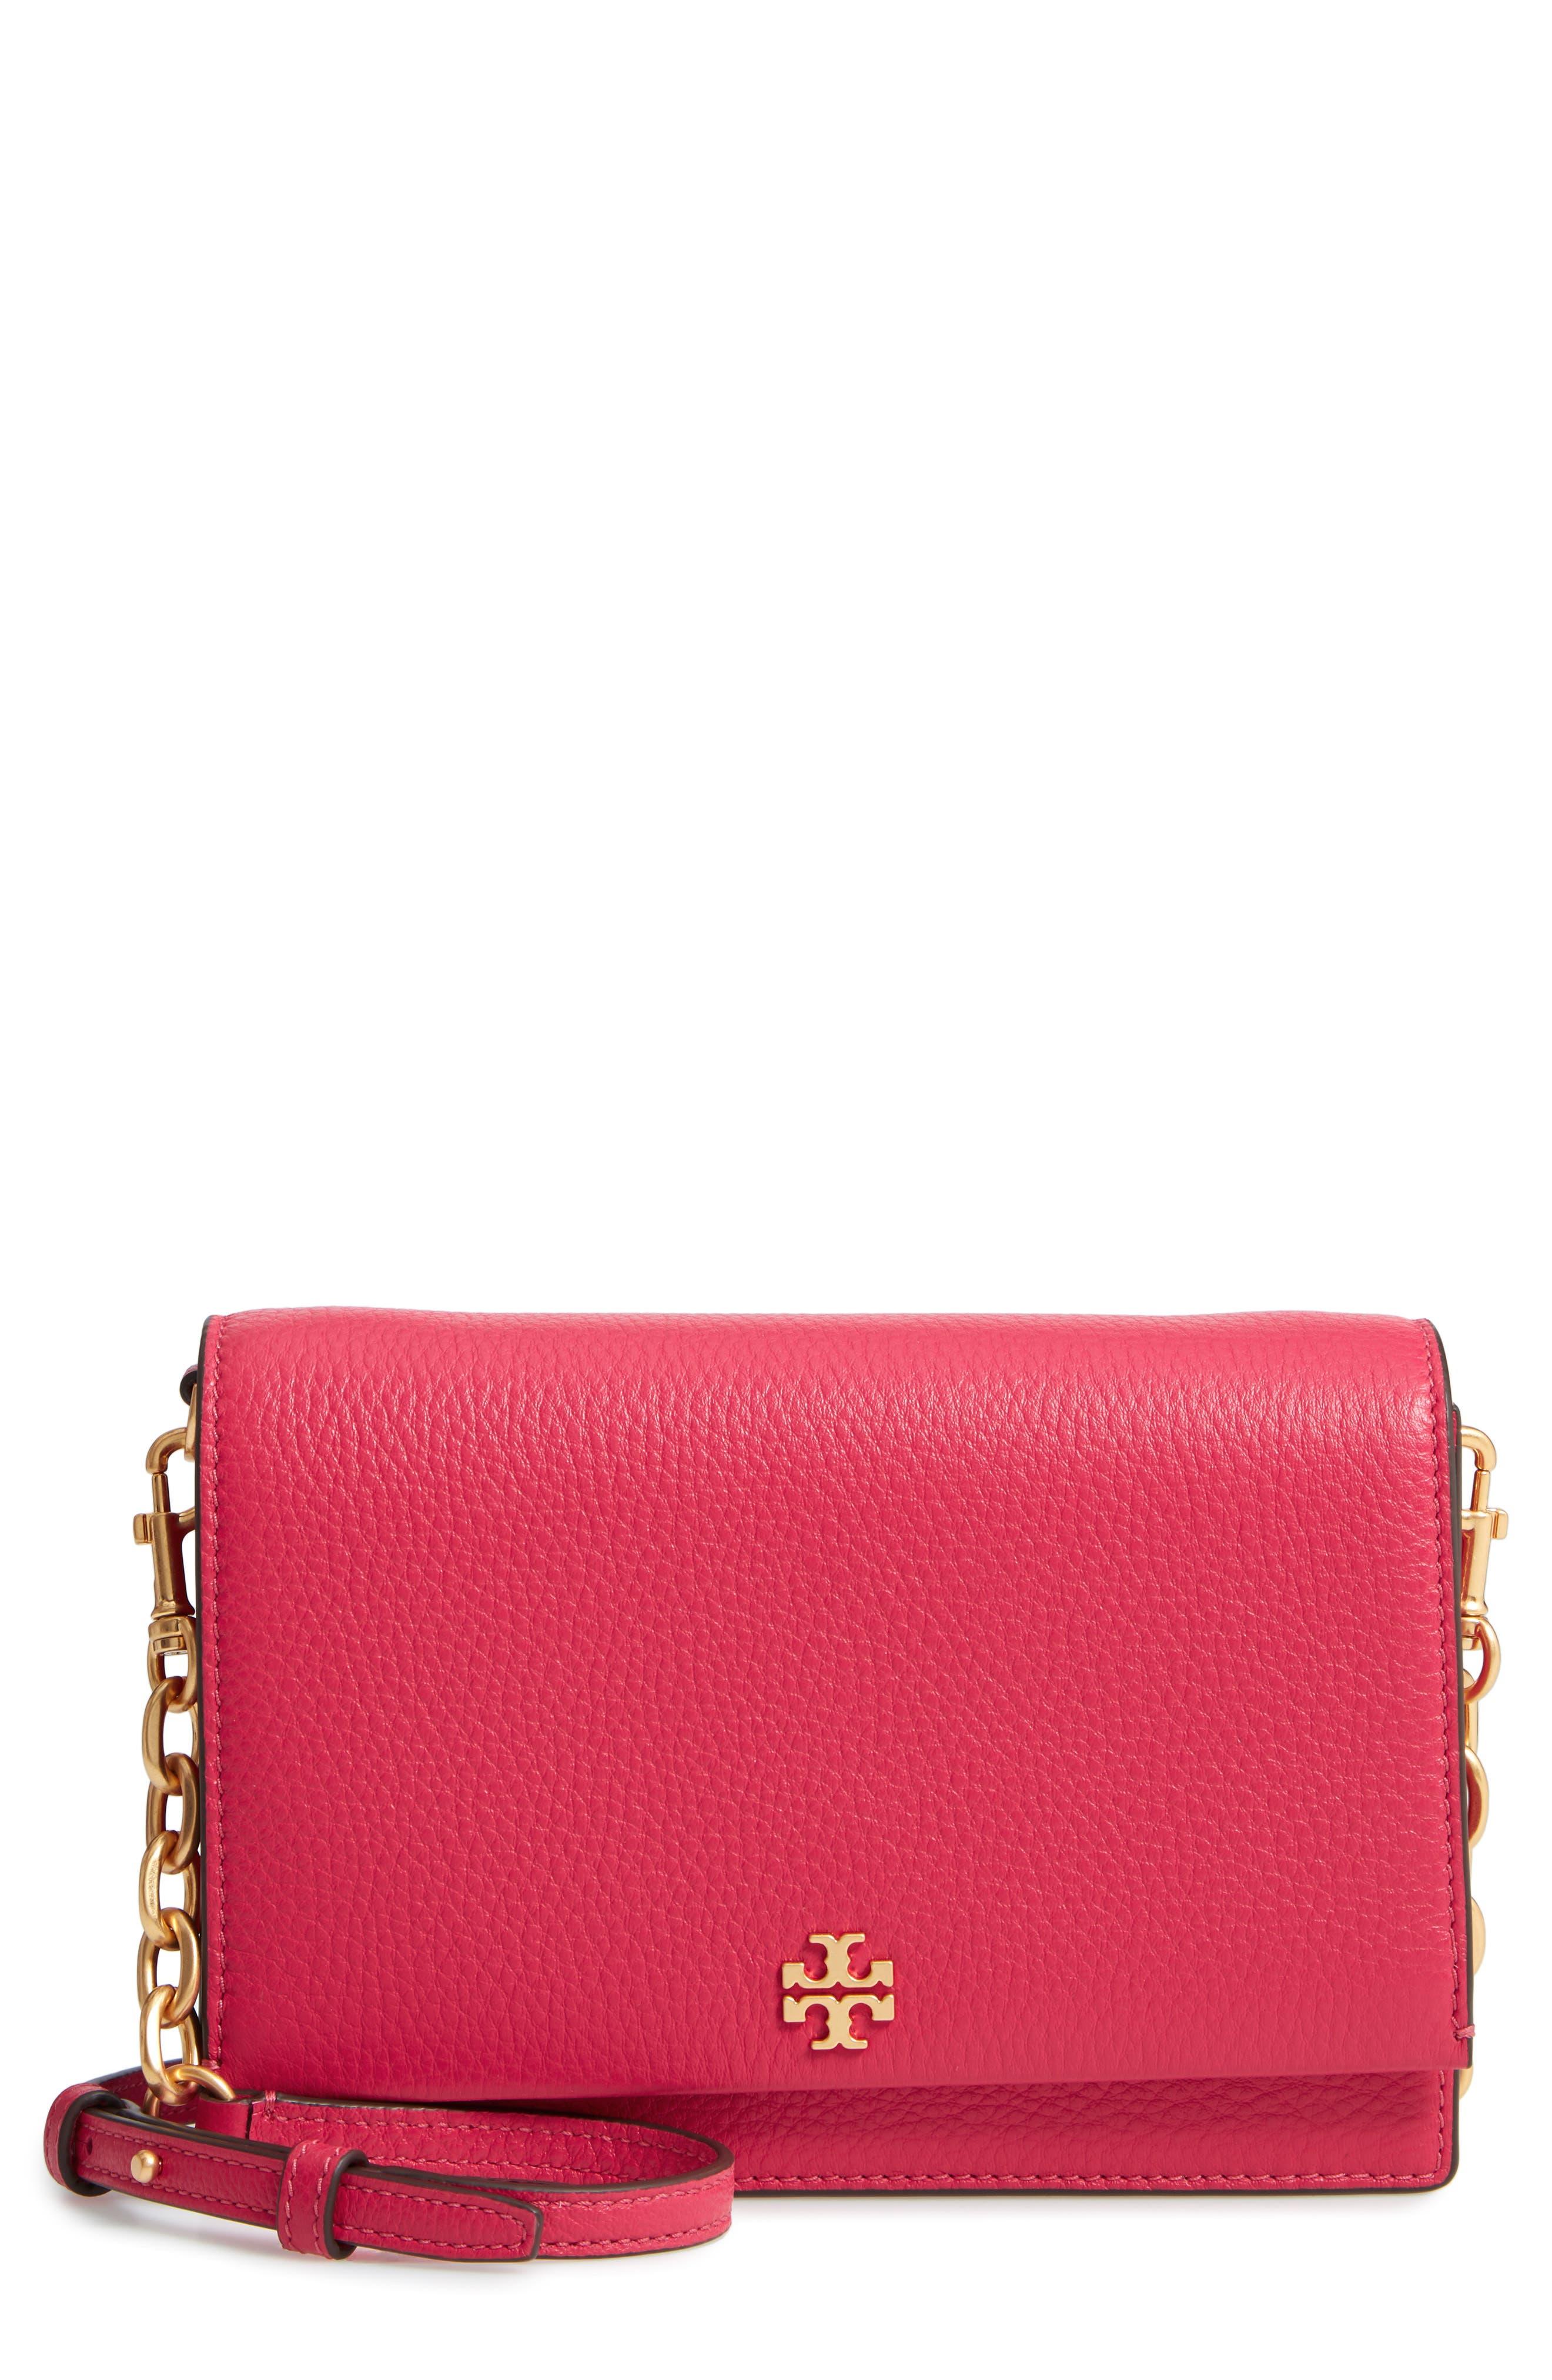 Georgia Pebble Leather Shoulder Bag,                         Main,                         color, Bright Azalea